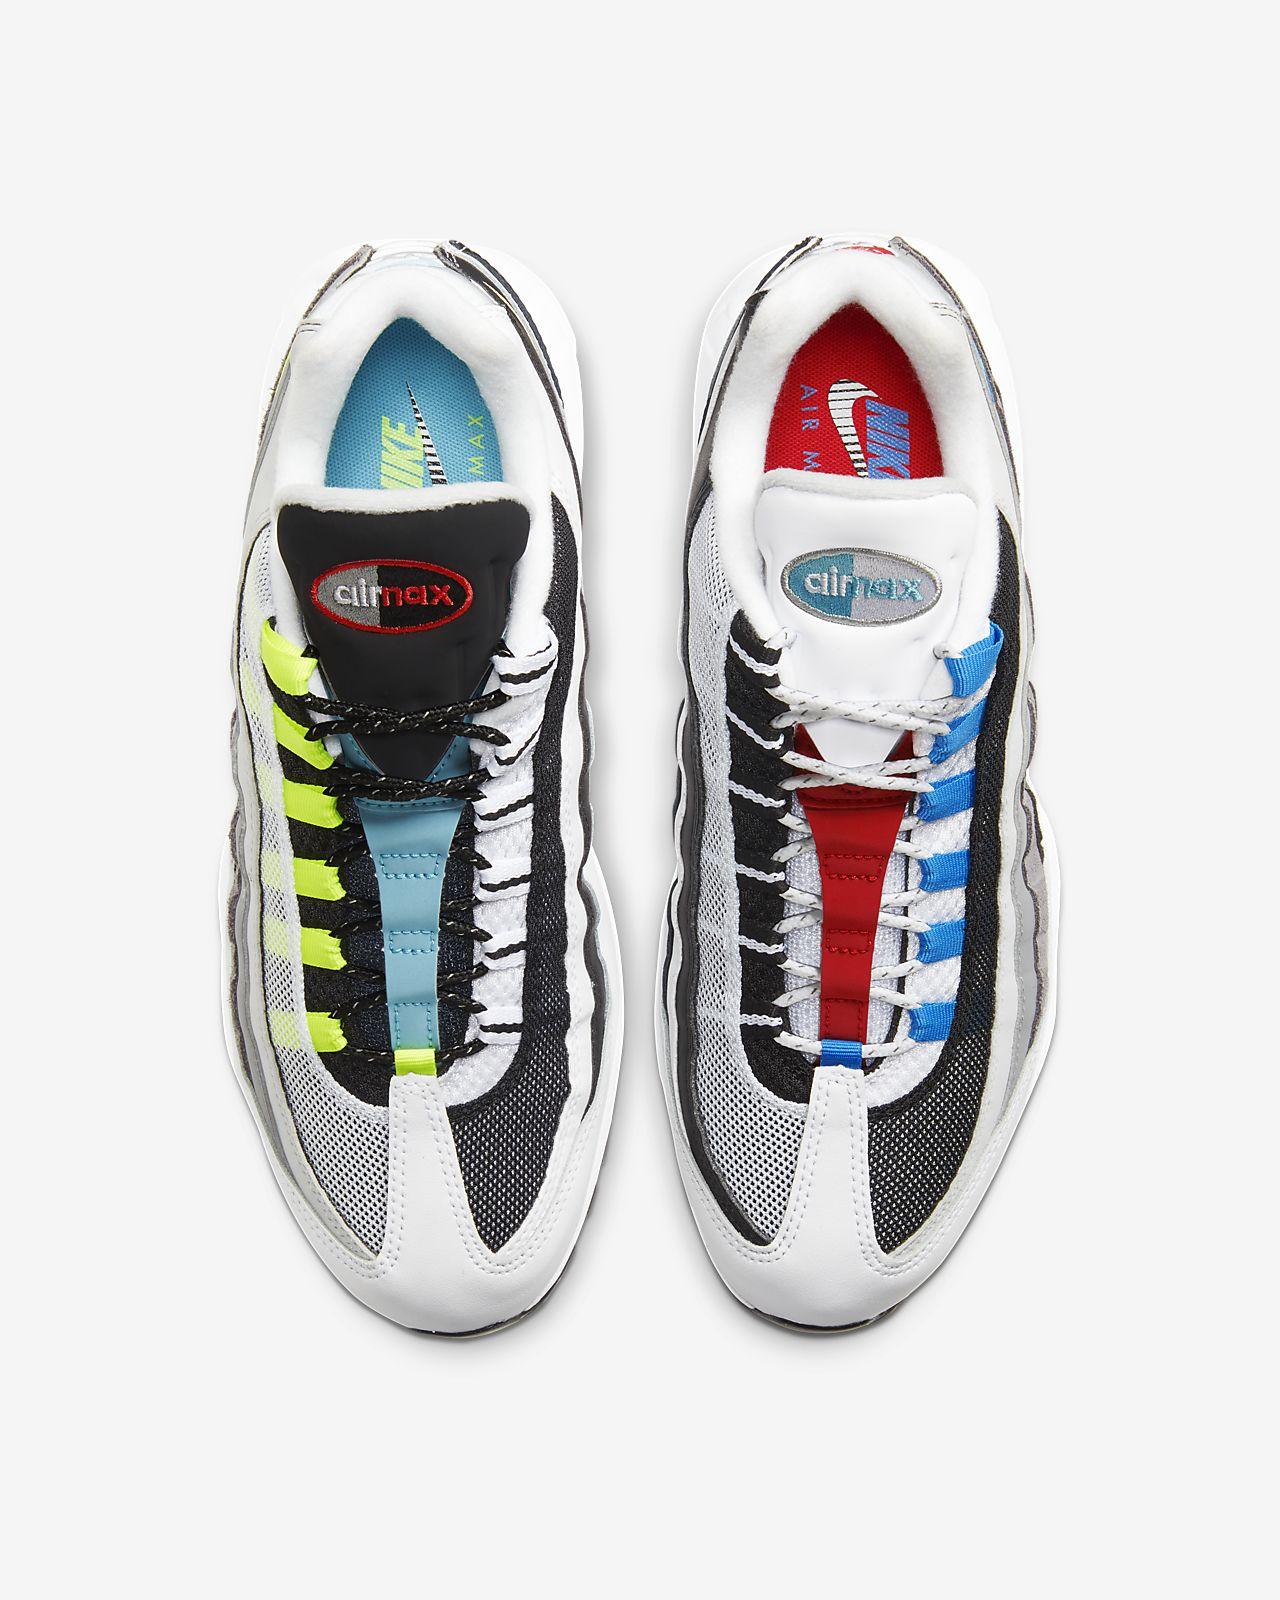 Nike Air Max 95 Zapatillas Hombre